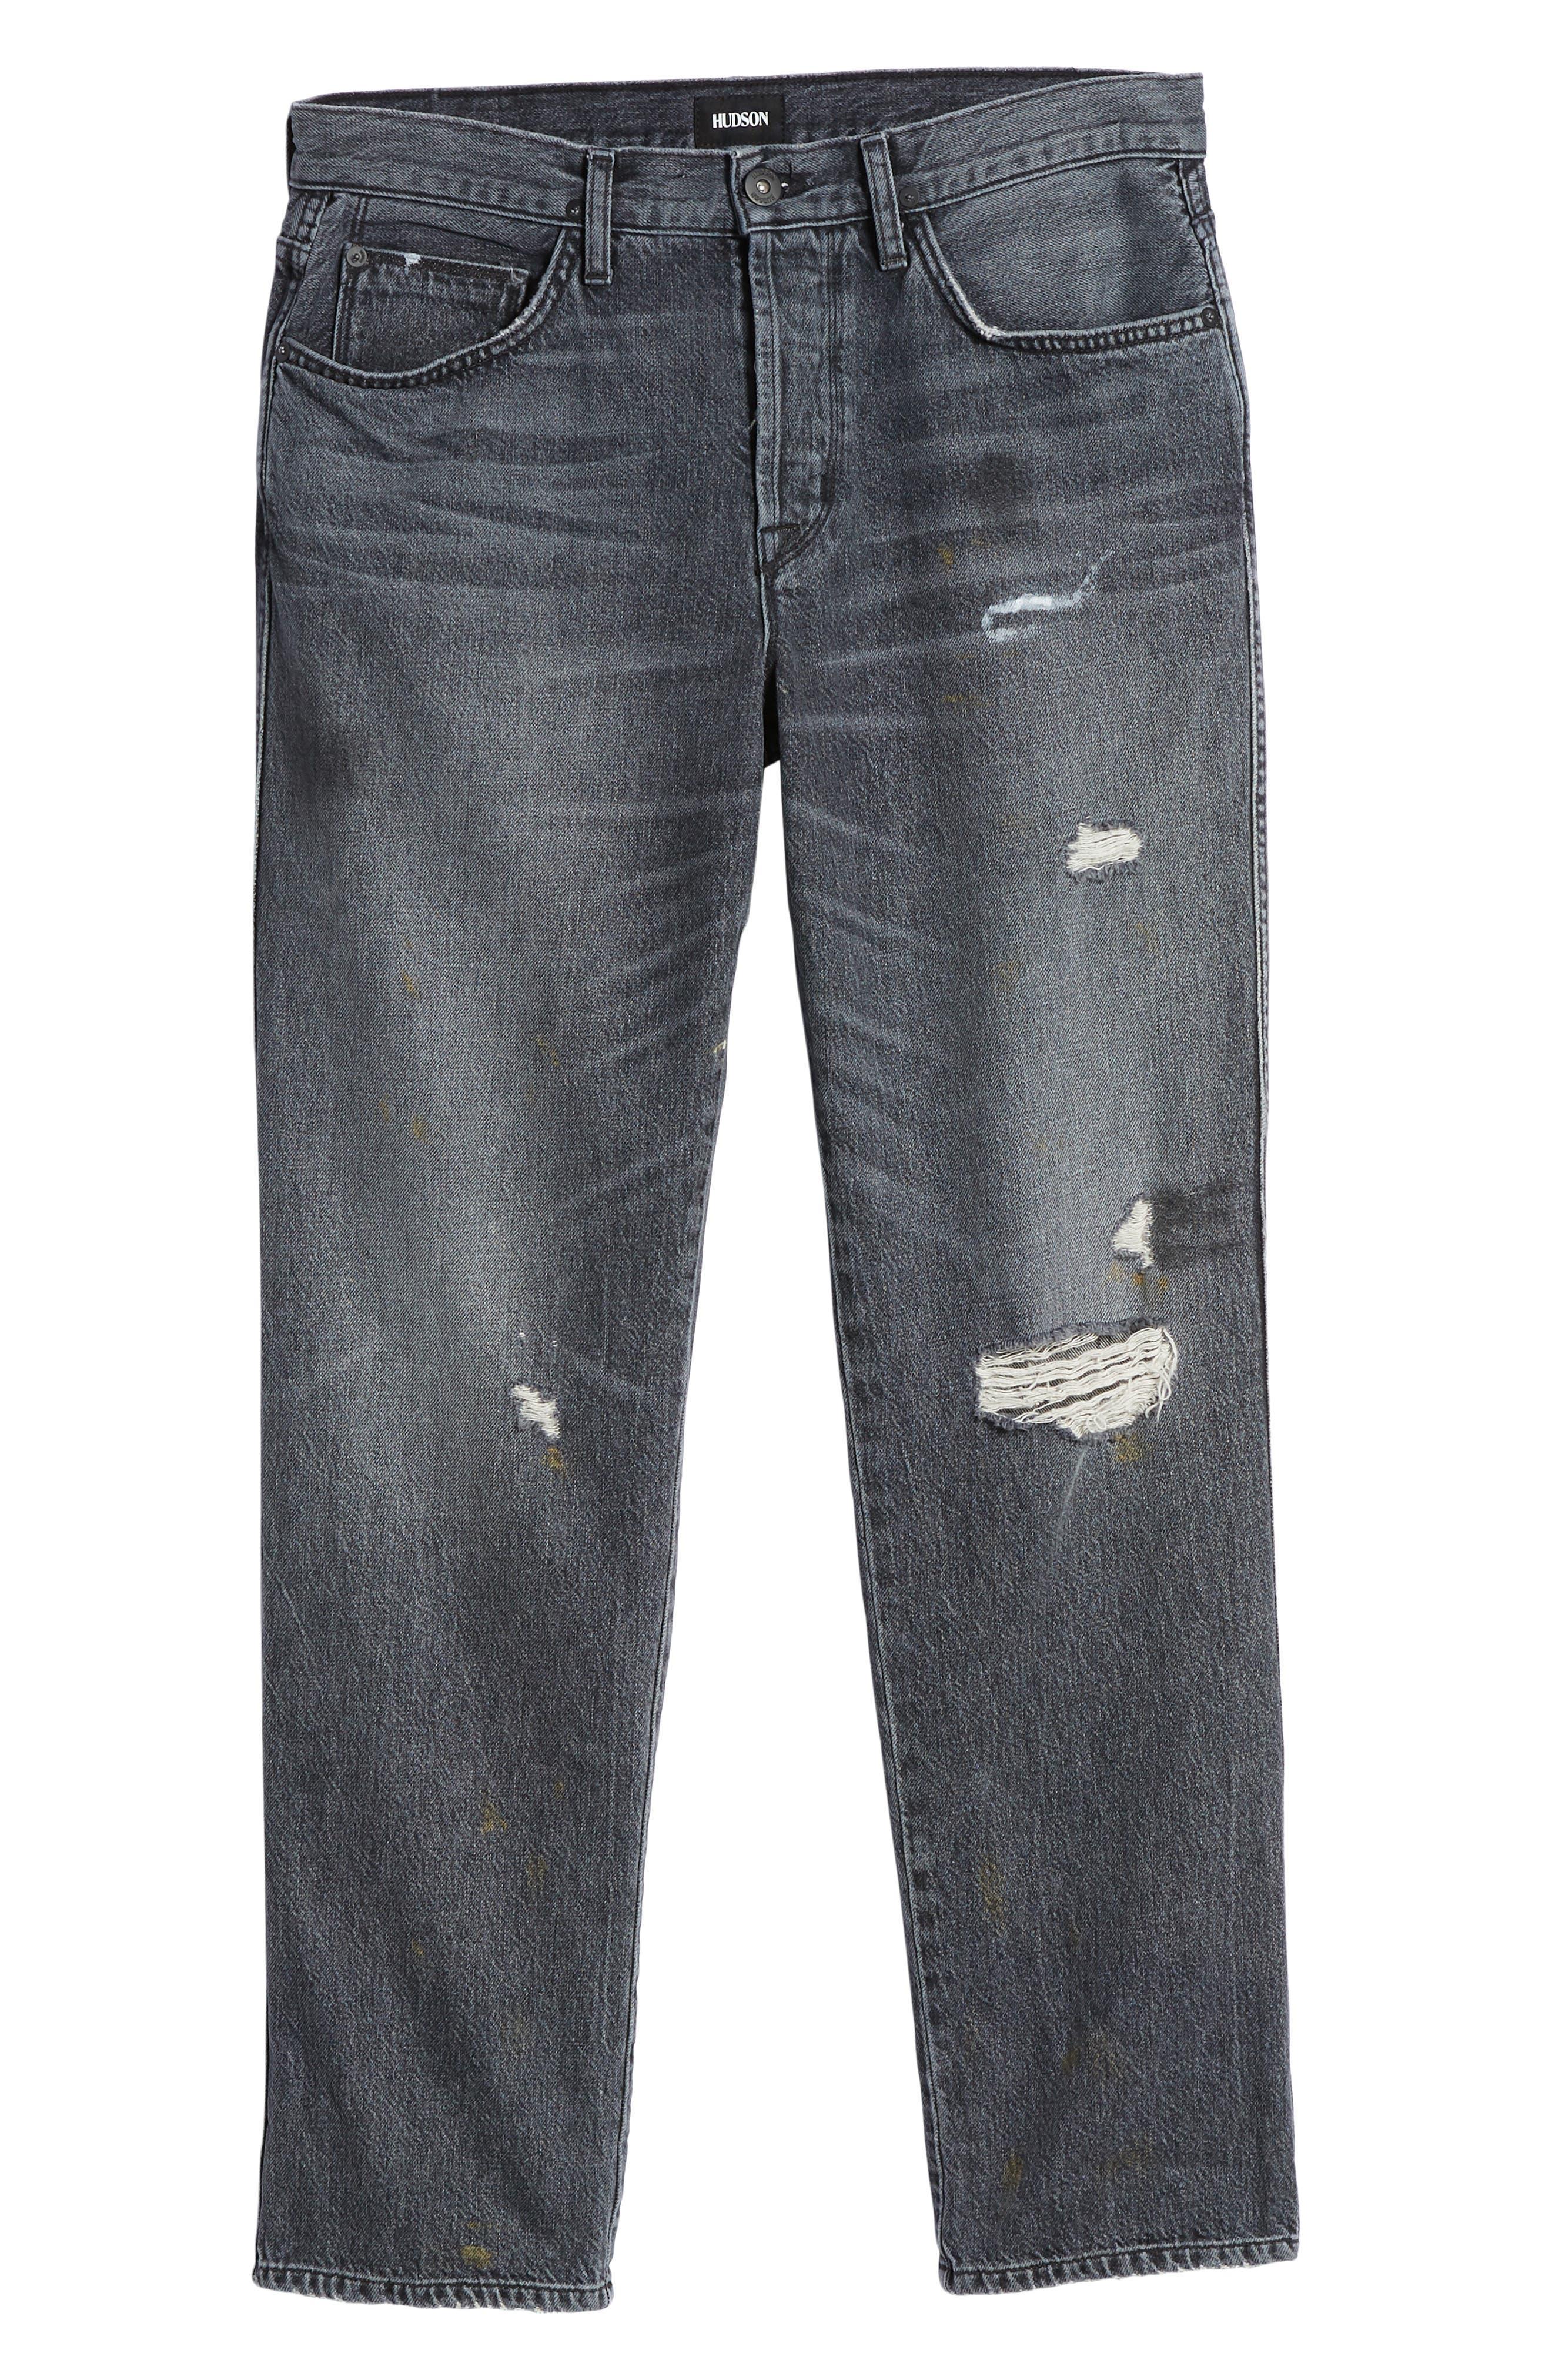 Dixon Straight Leg Jeans,                             Alternate thumbnail 6, color,                             IRON HEAD